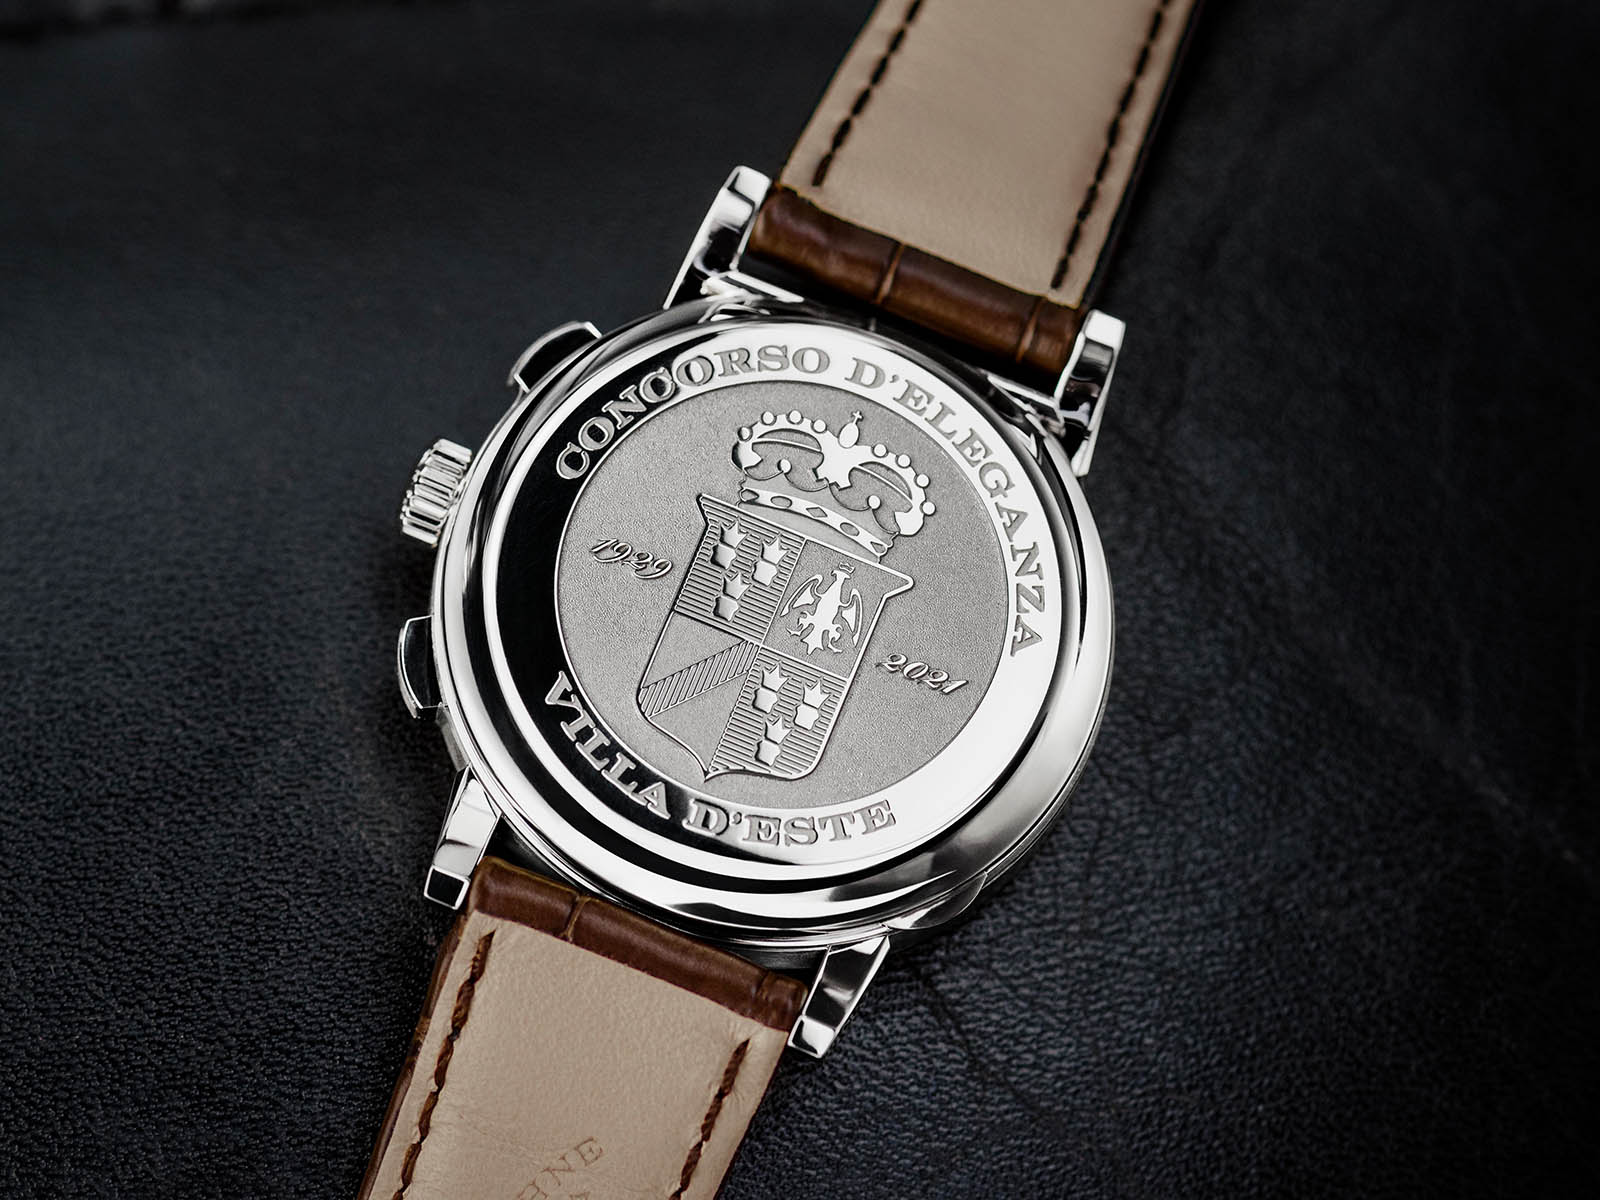 414-049-a-lange-sohne-1815-chronograph-2021-concorso-edition-7.jpg